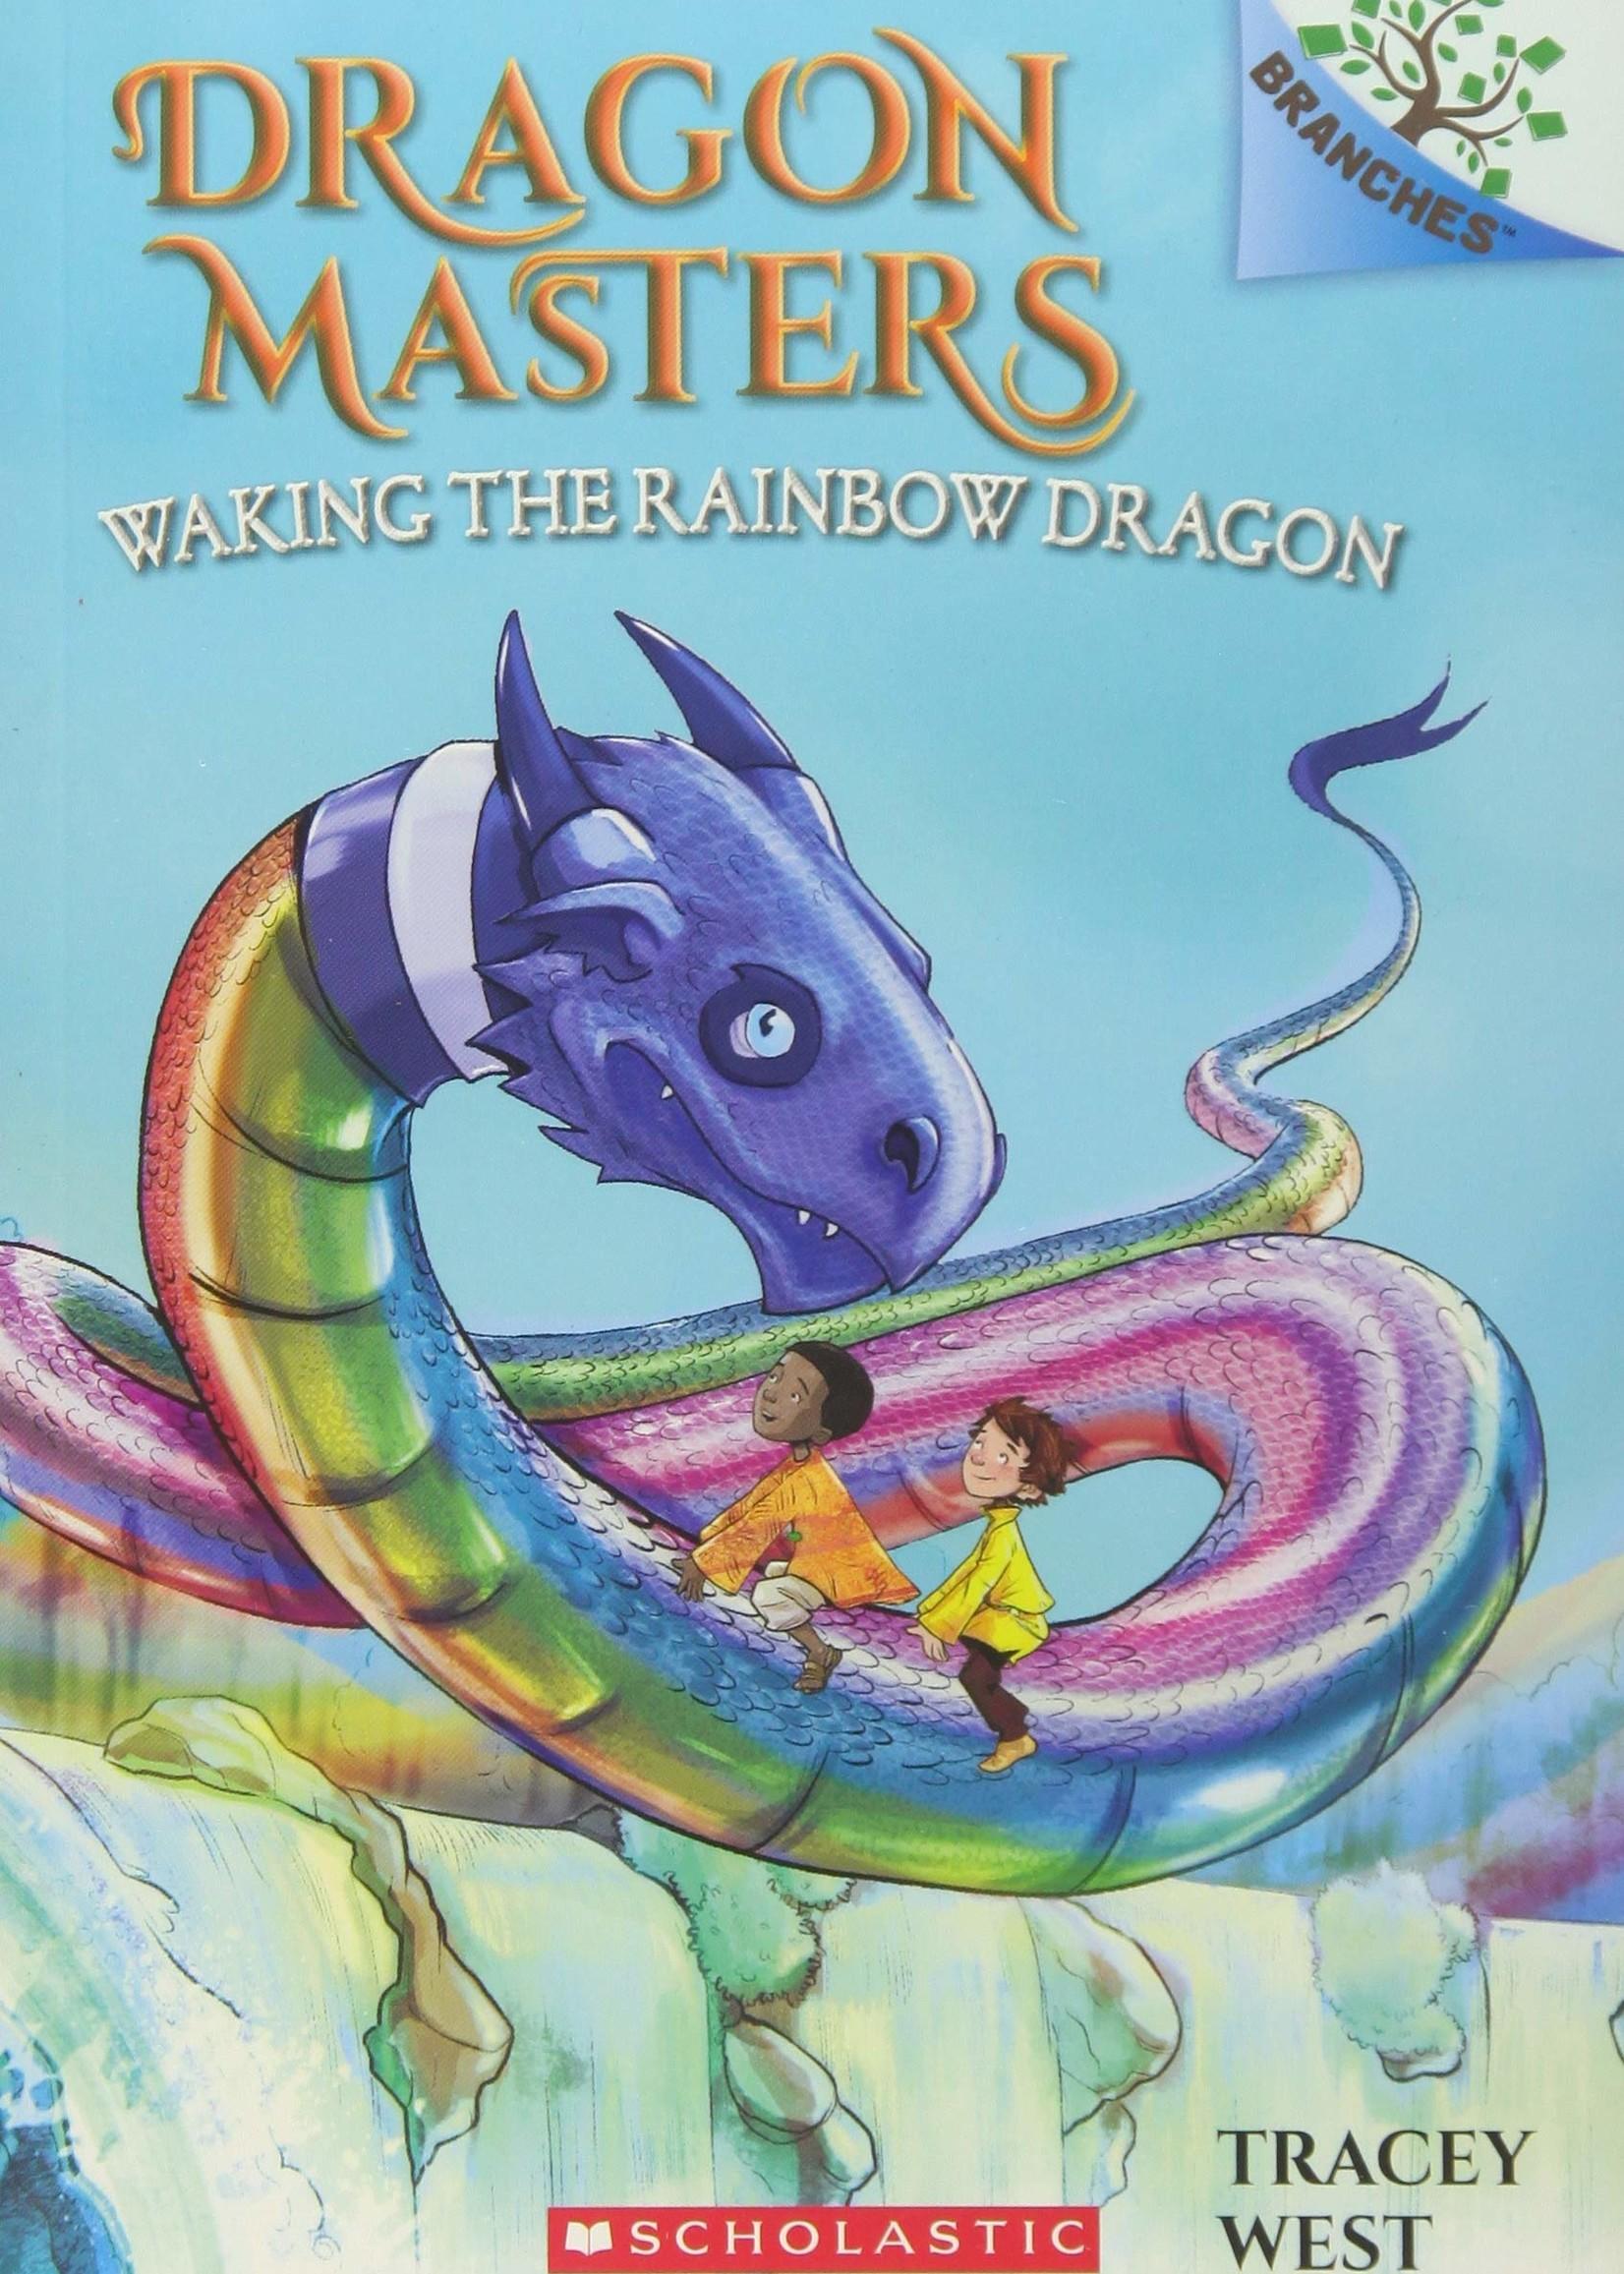 Dragon Masters #10, Waking the Rainbow Dragon - Paperback